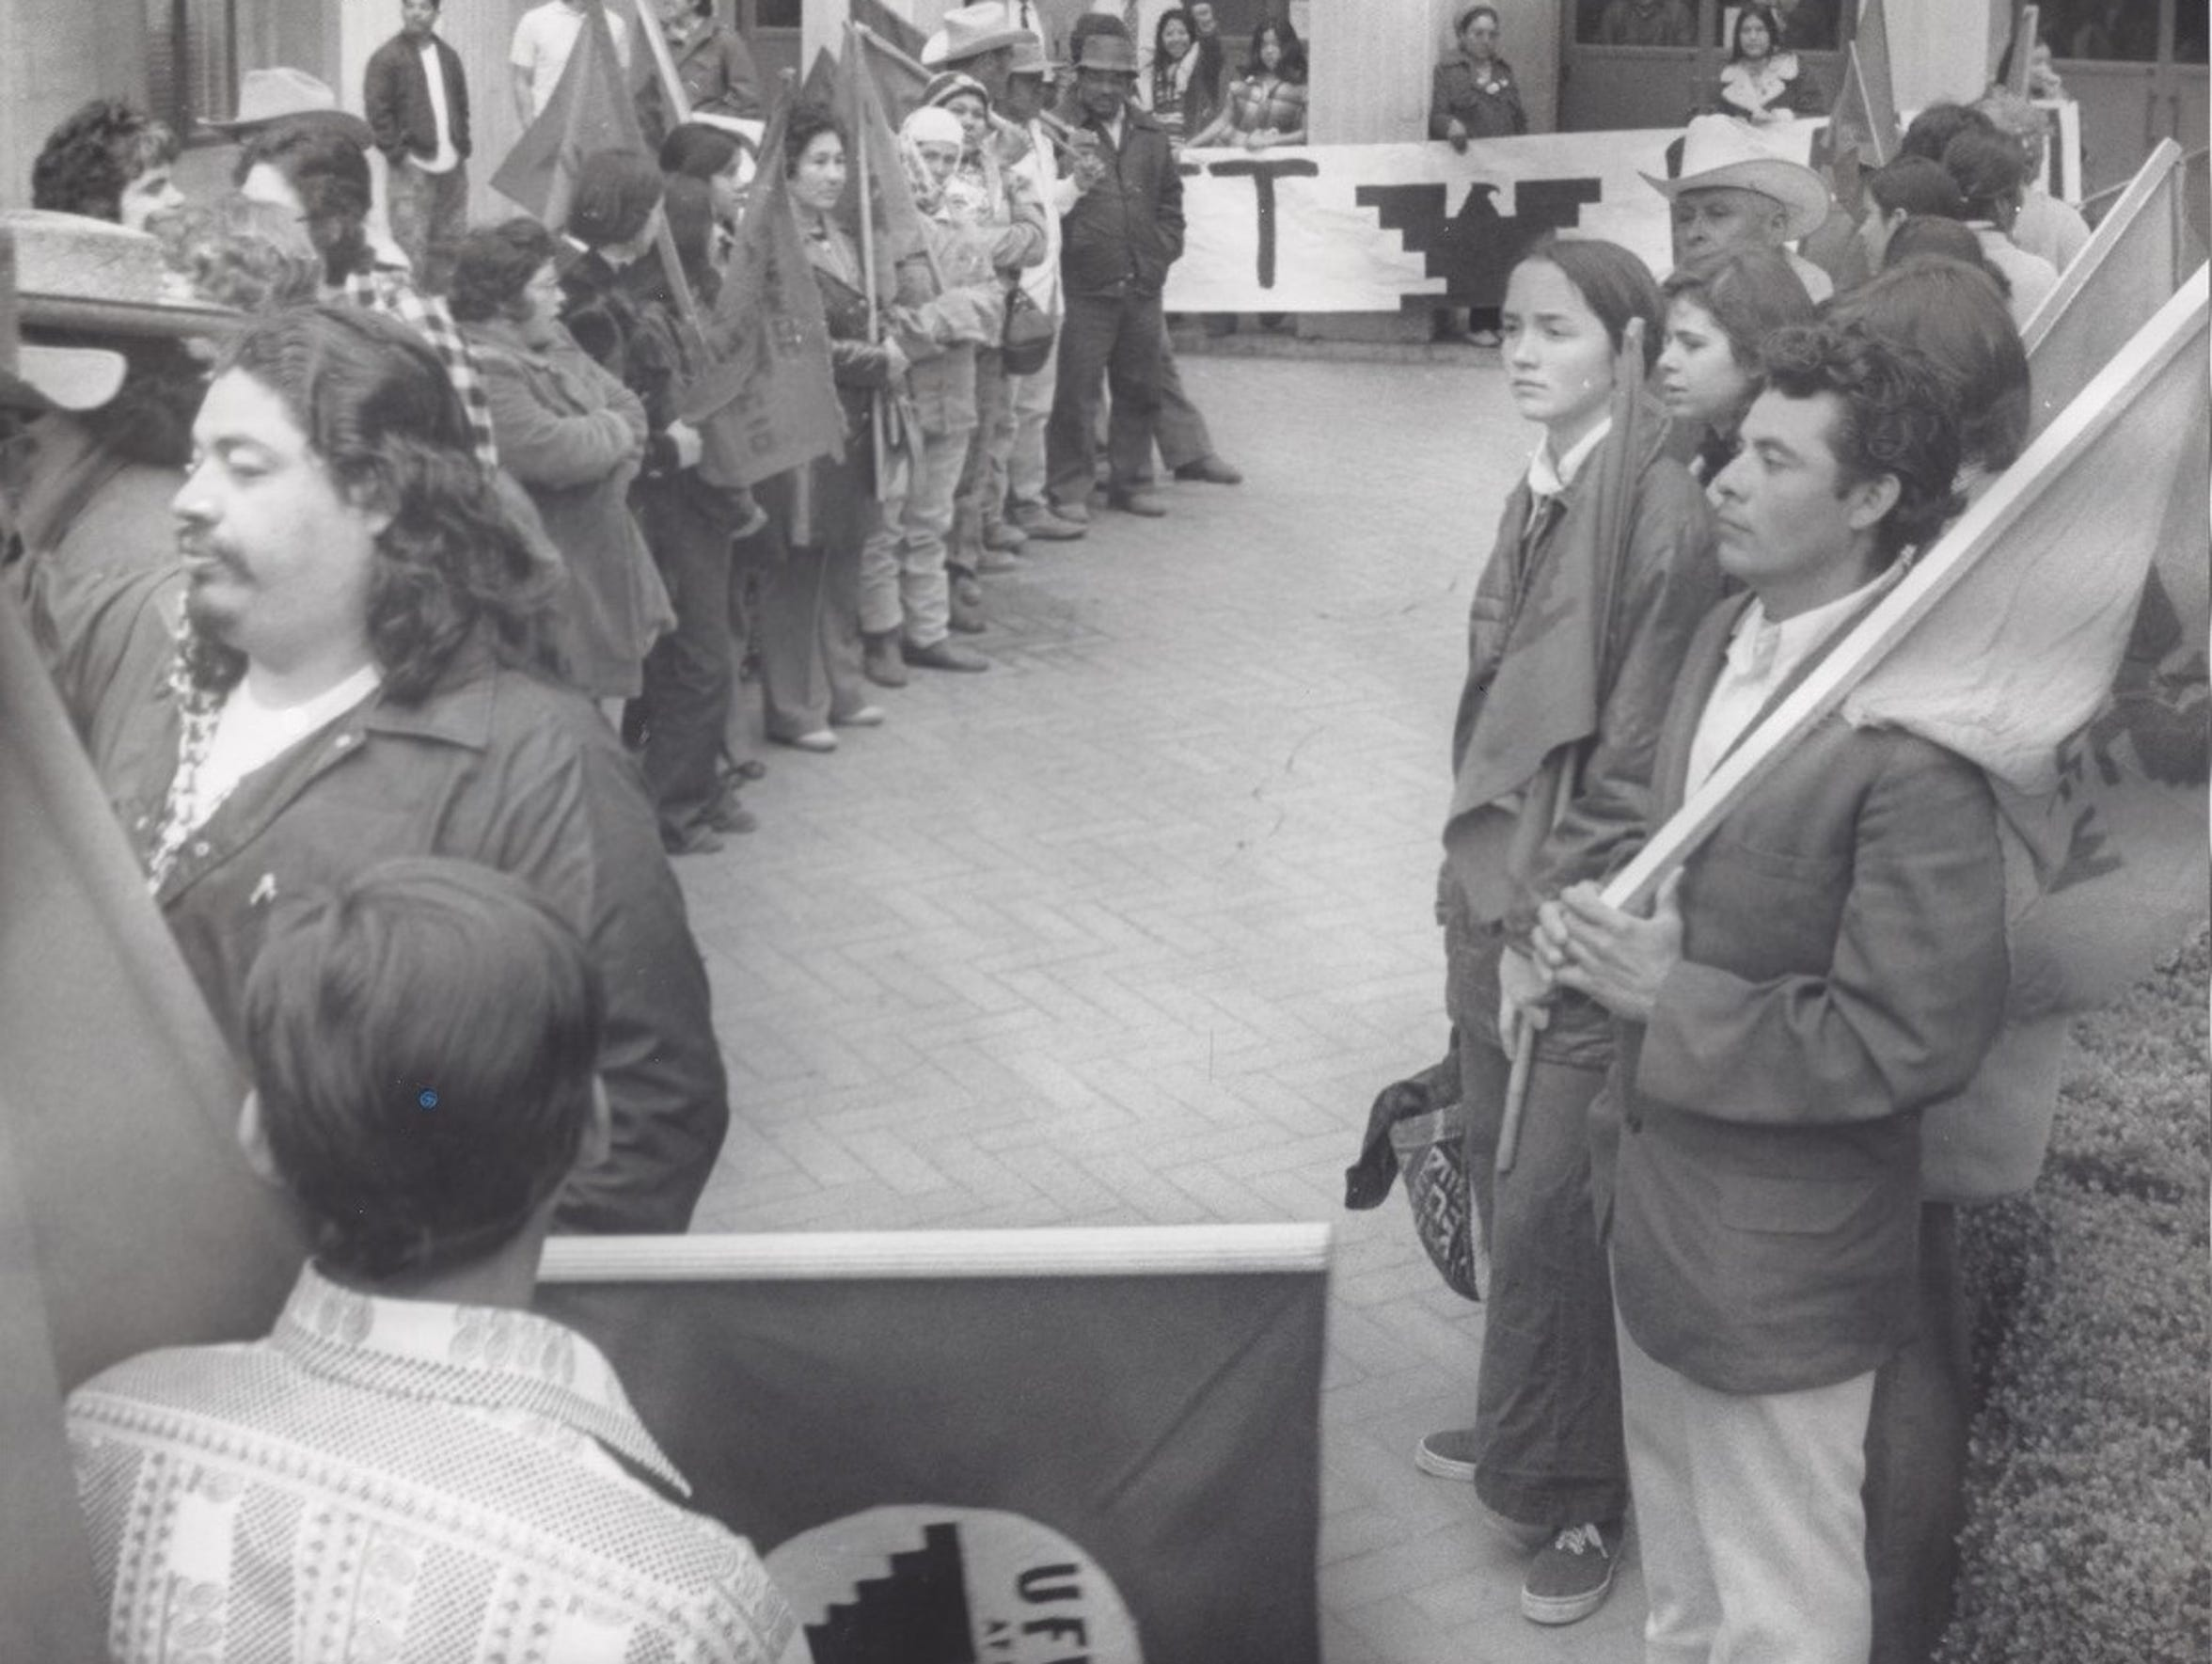 The labor strike in 1974. The Chicano/Chicana movements